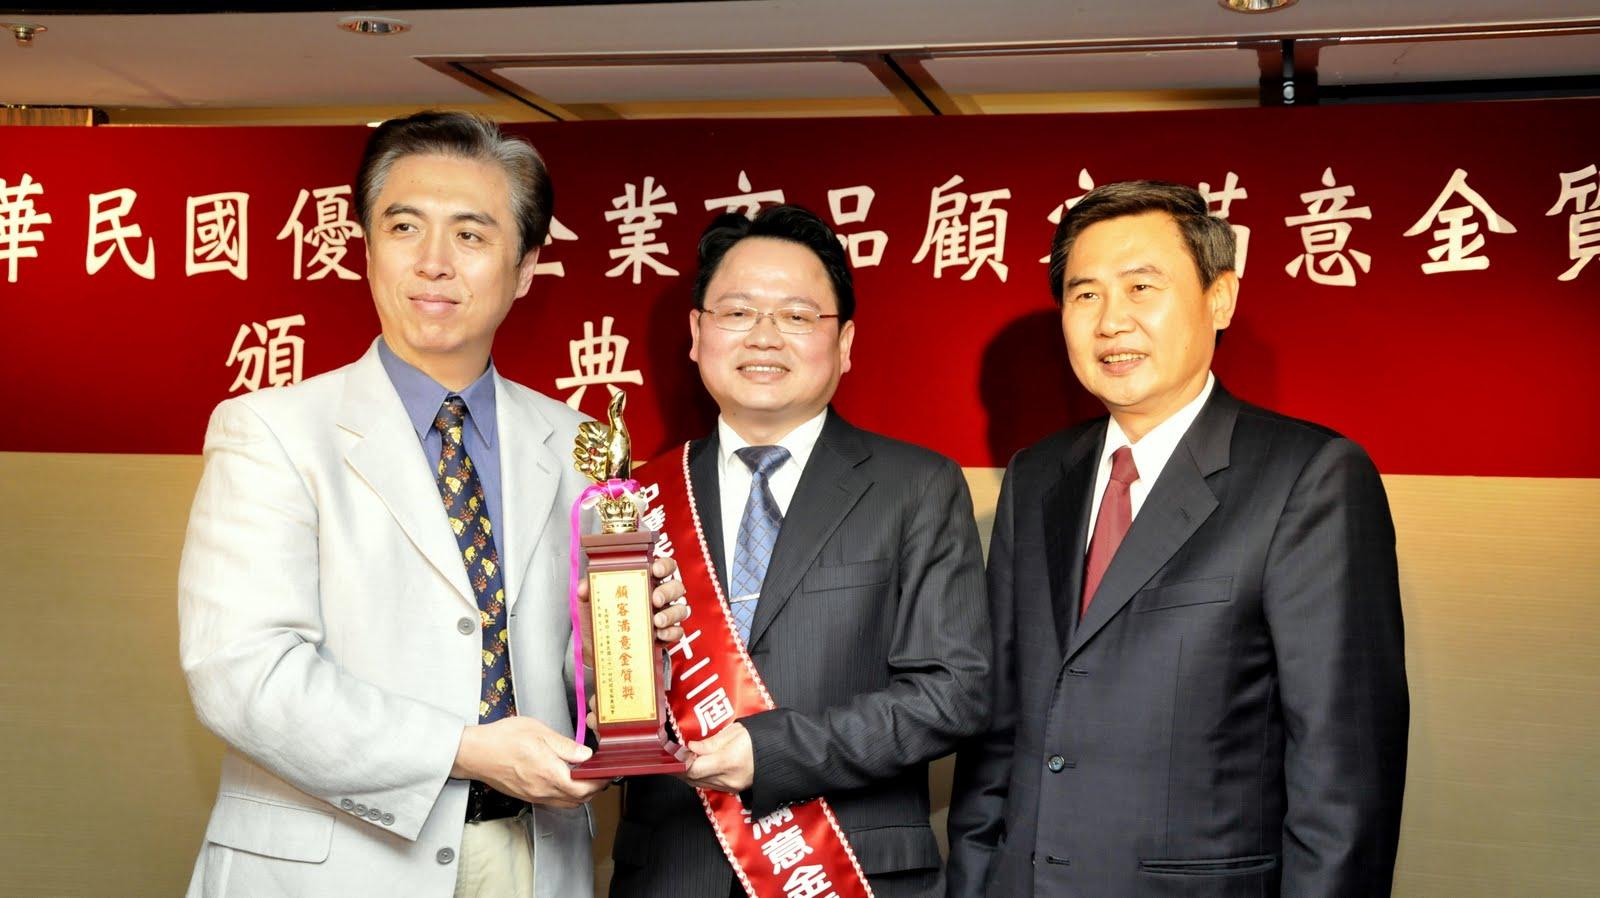 Awarded 12th Customer Satisfactin Golden Prize